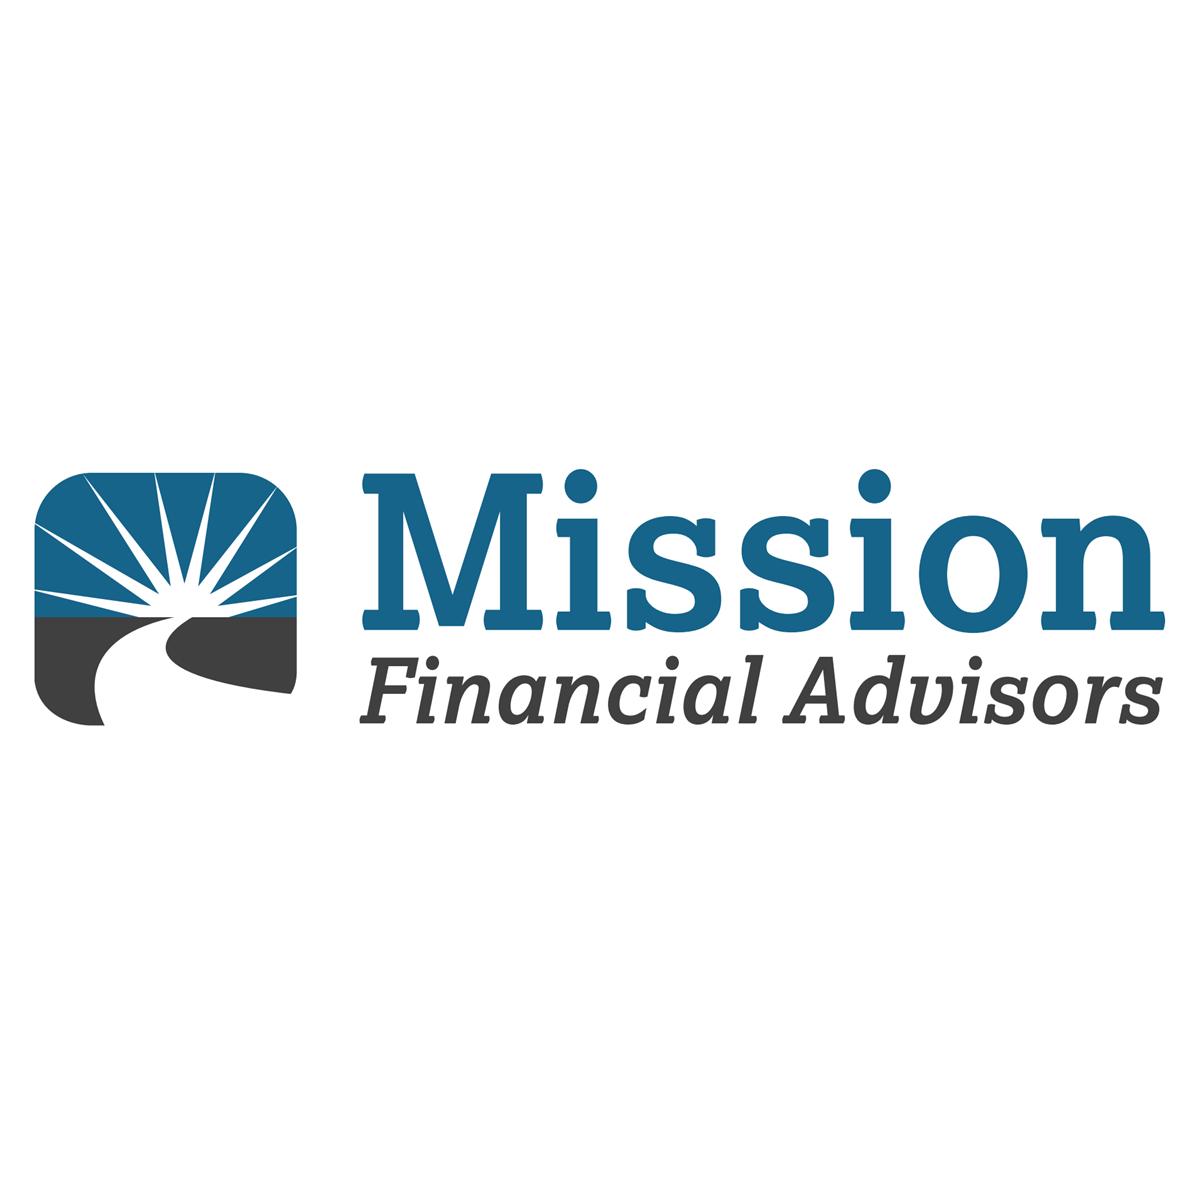 Mission Financial Advisors - Martinsburg, WV - Financial Advisors